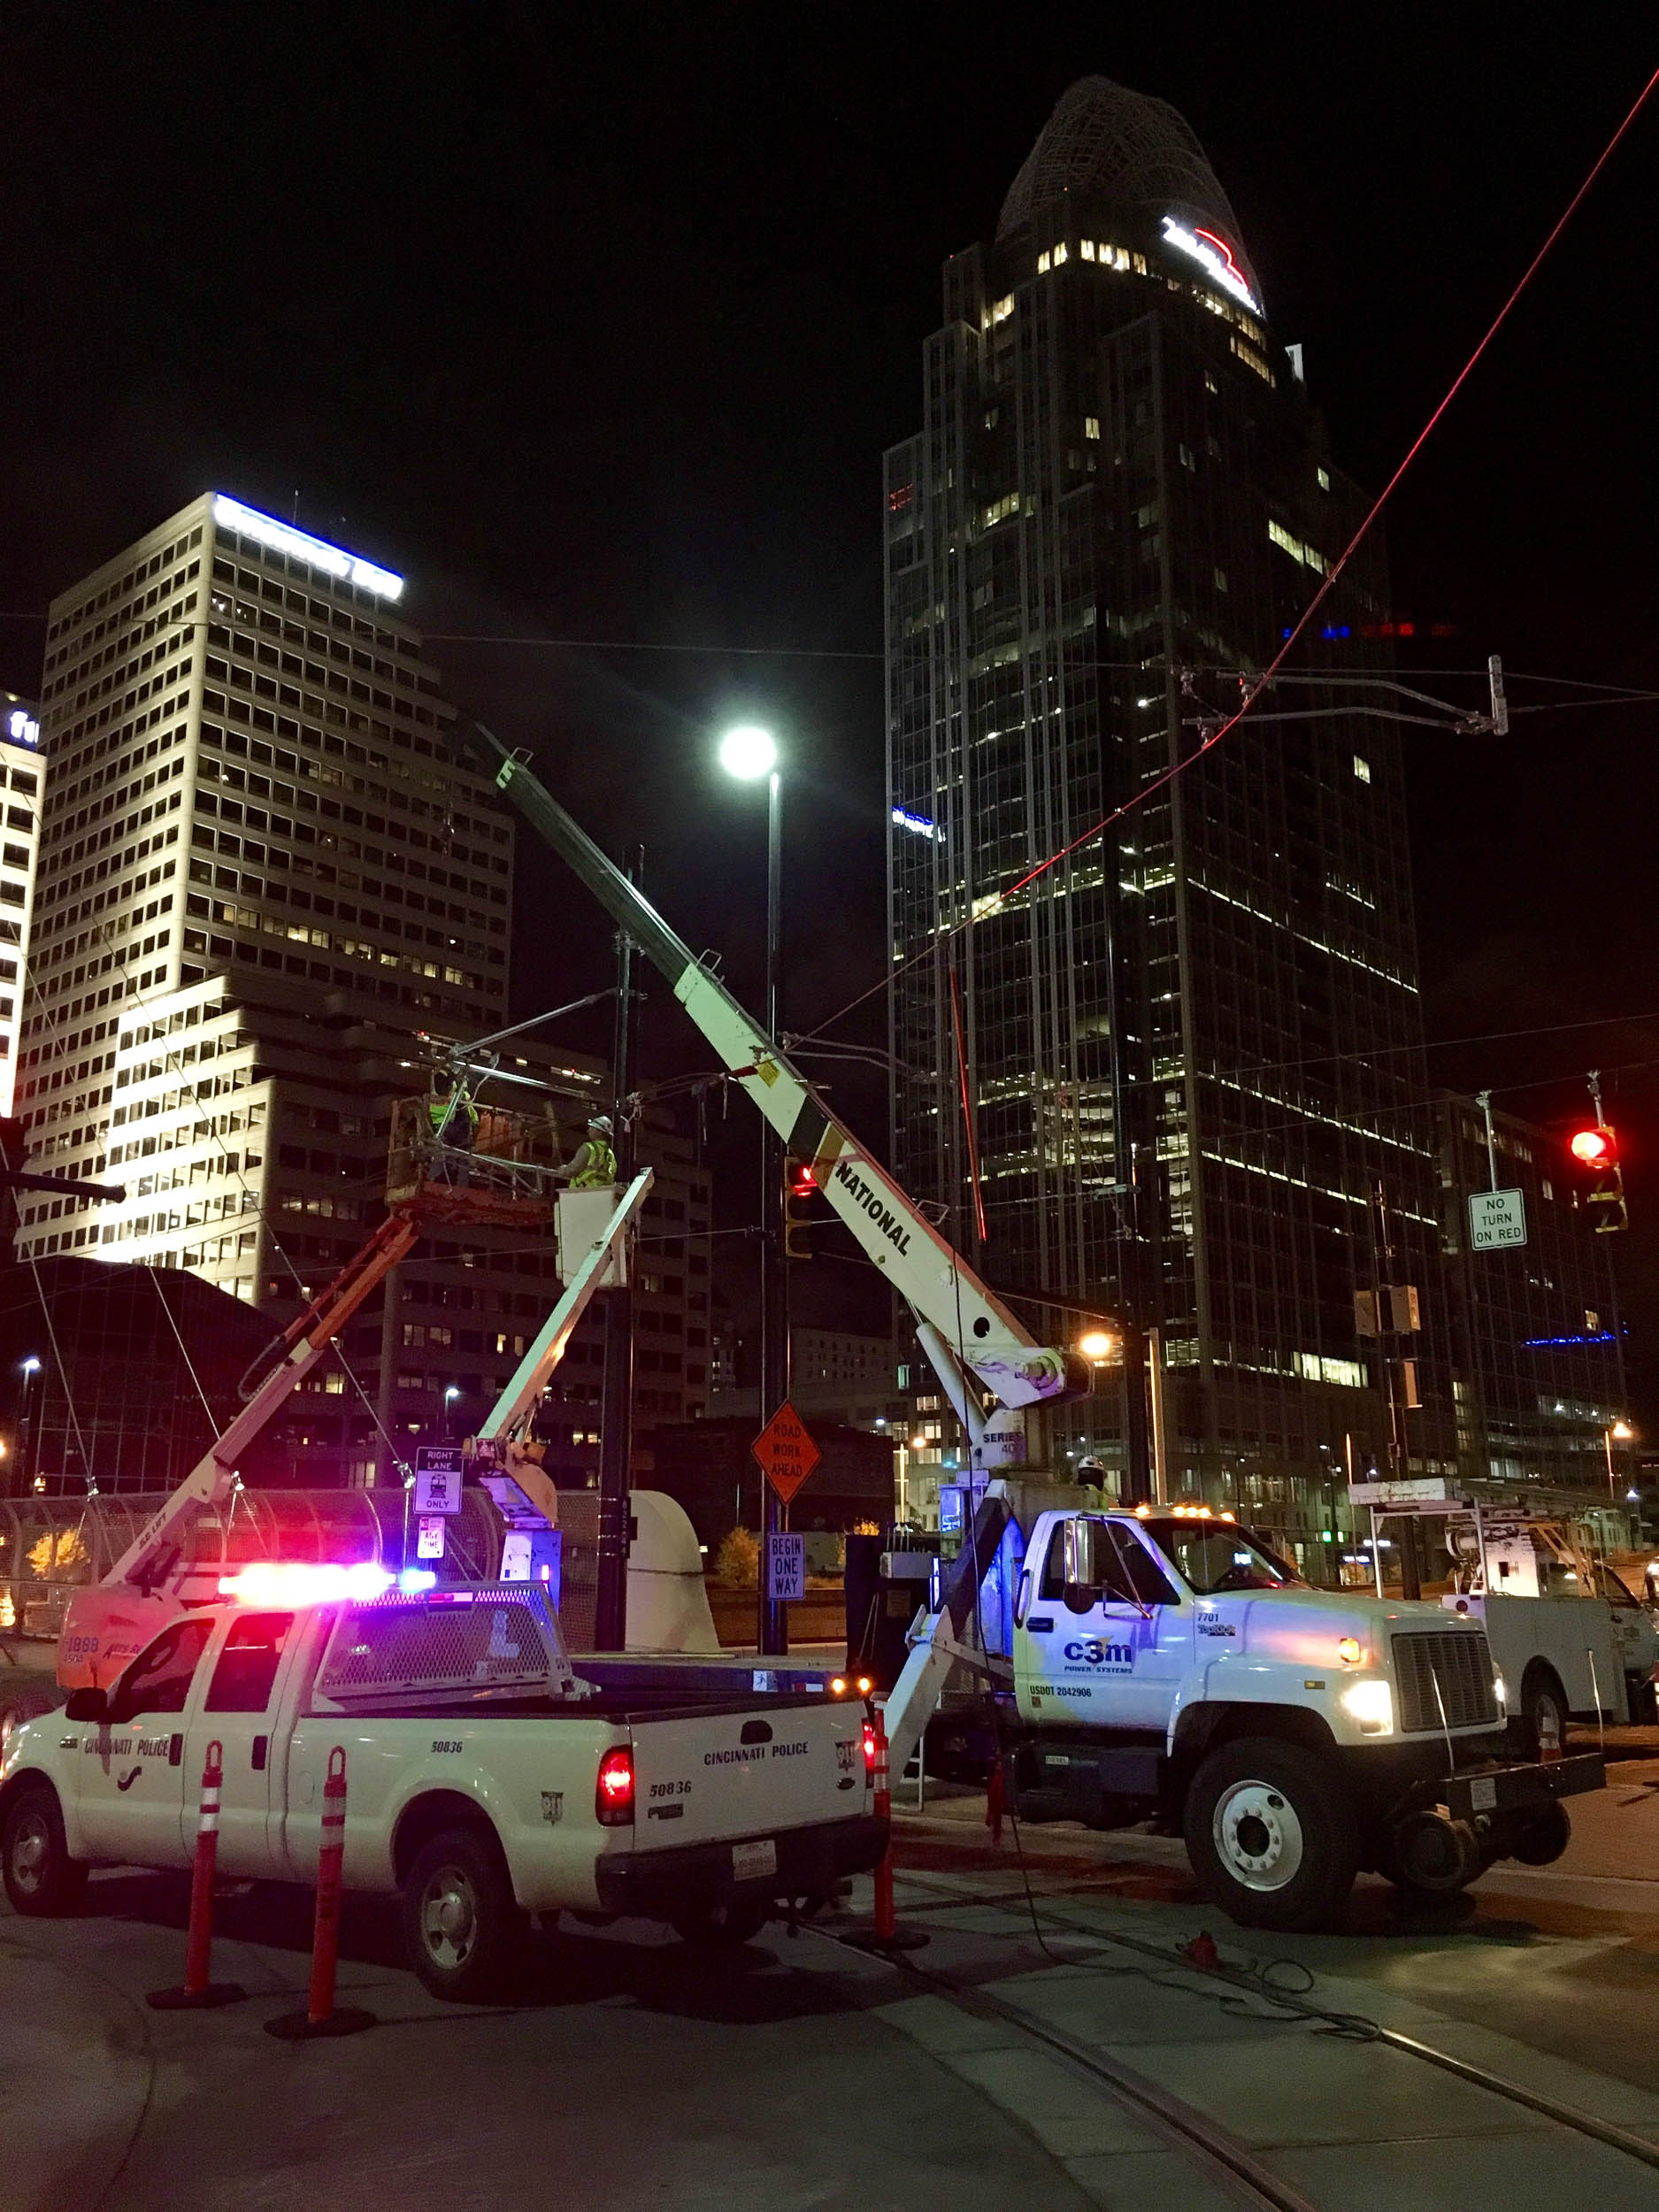 Cinci Streetcar Guys Working at Night.jpg